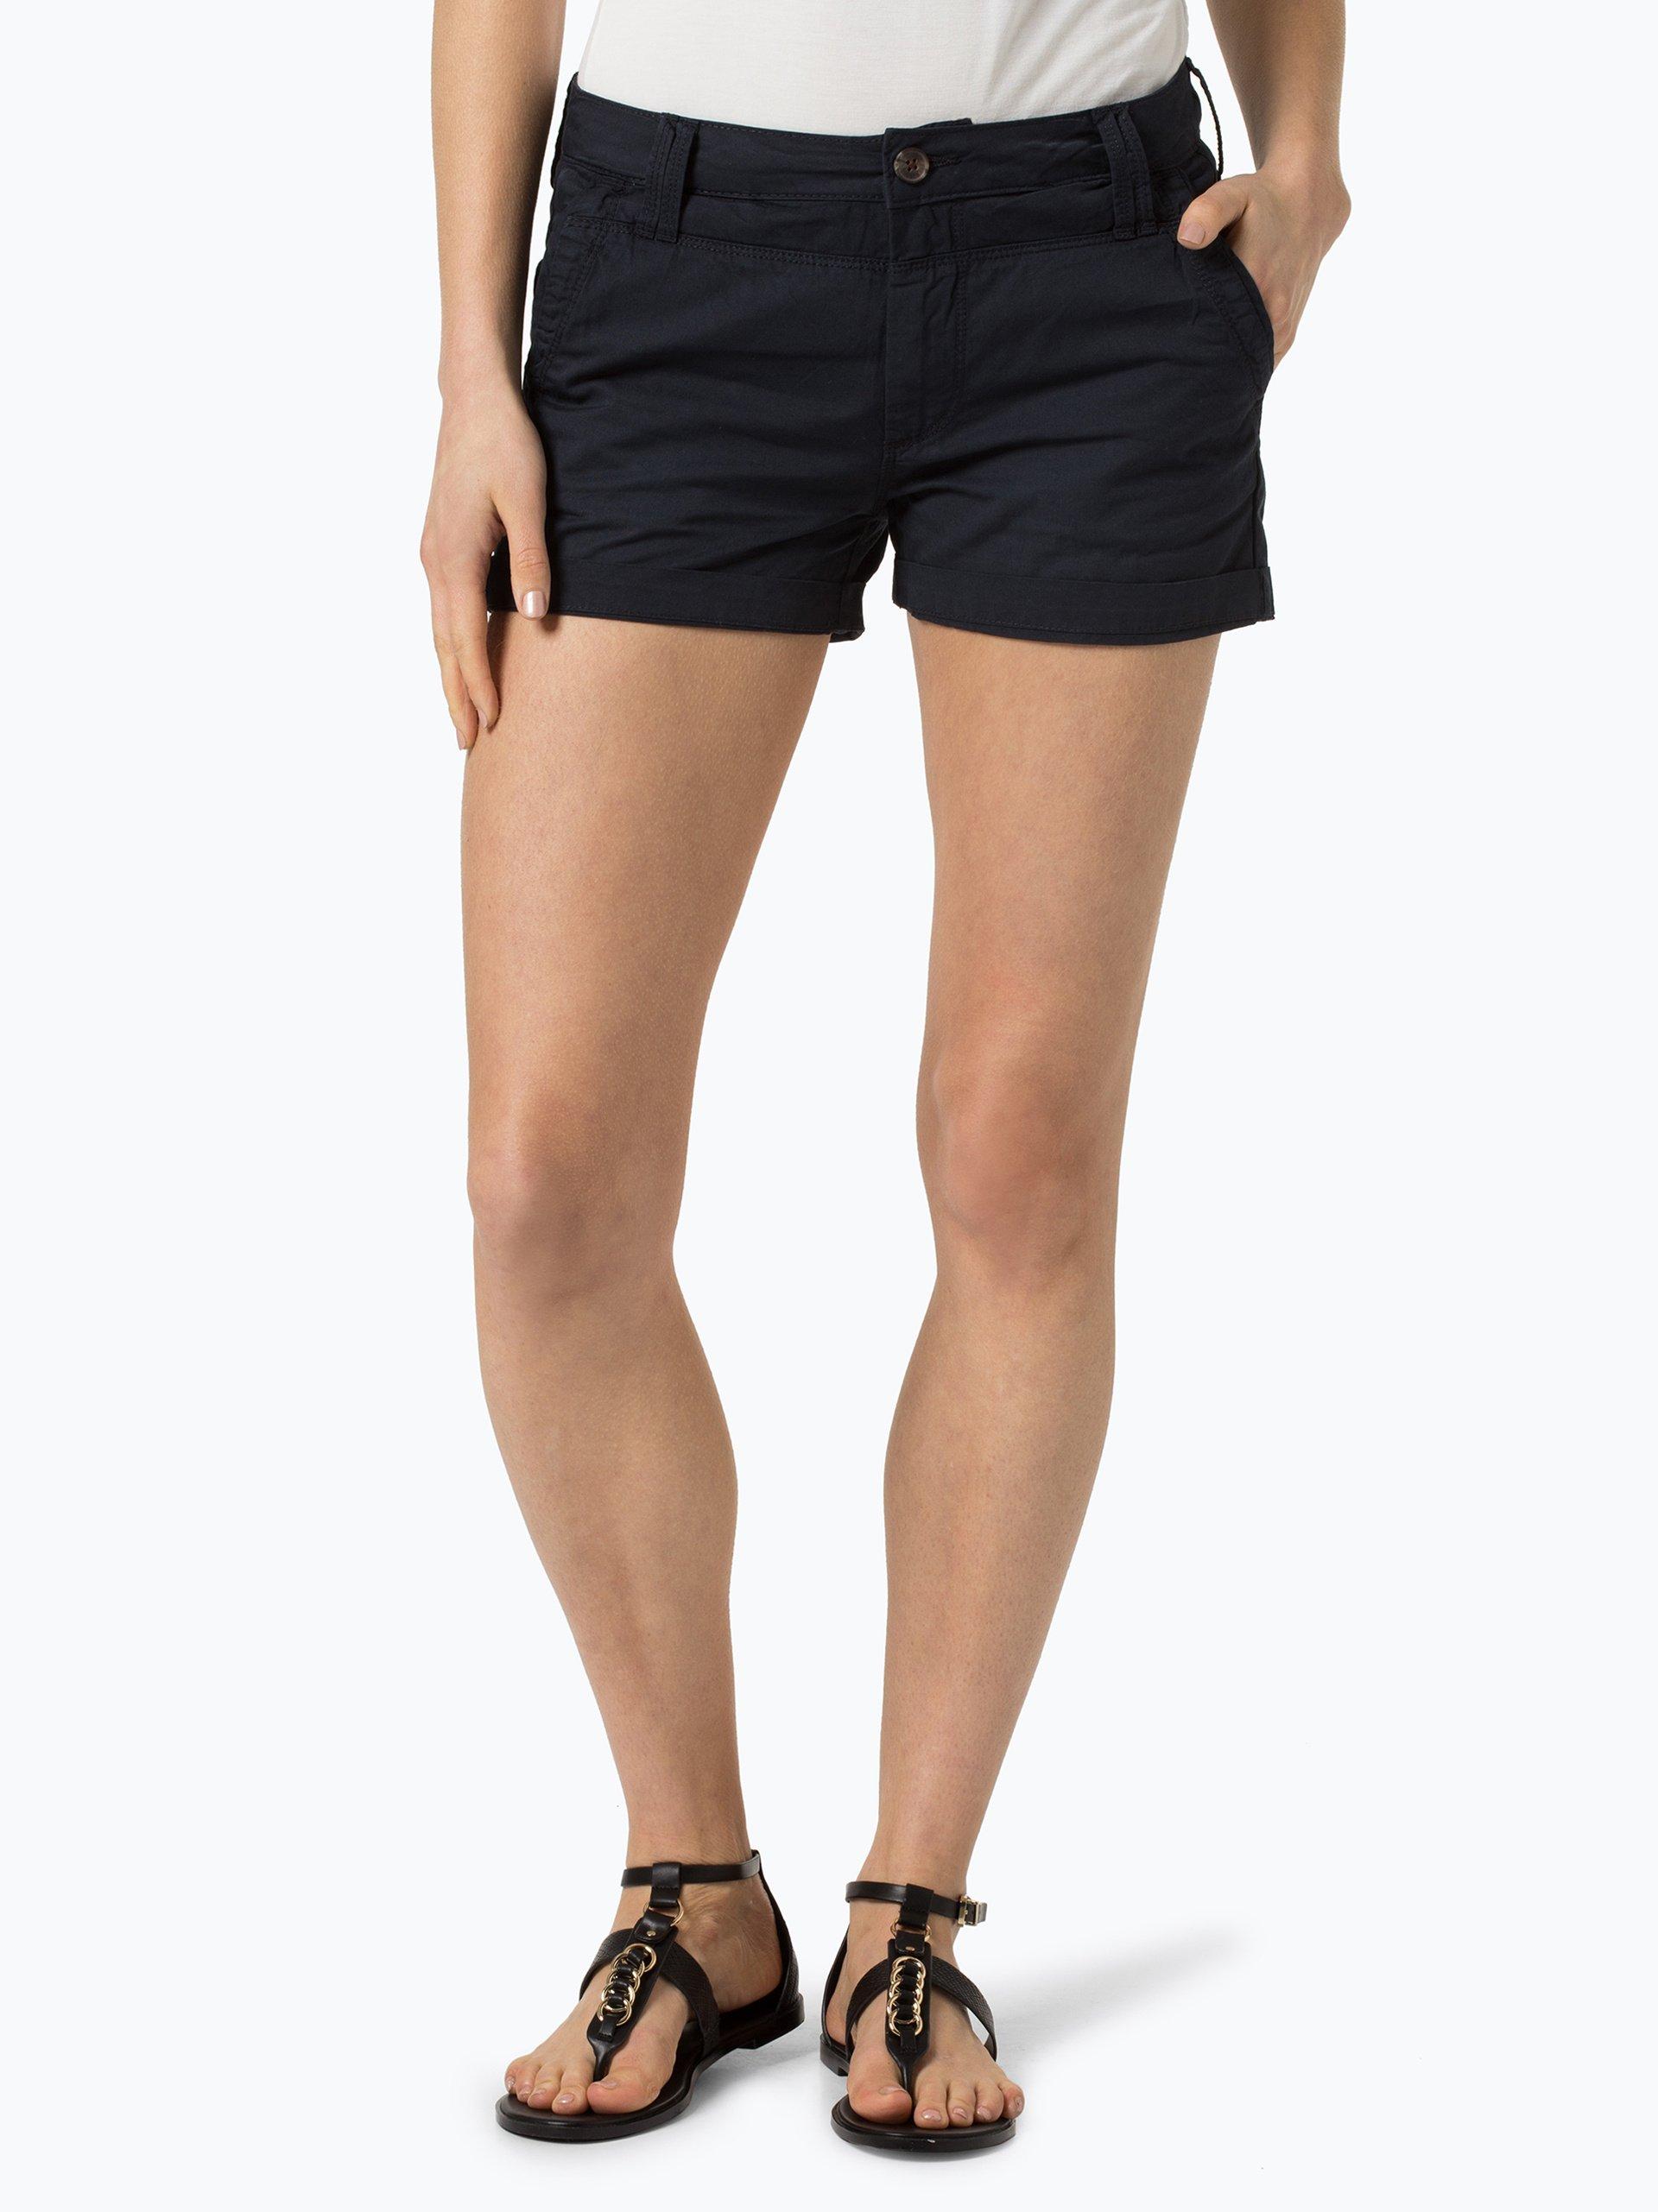 pepe jeans damen shorts balboa marine uni online kaufen vangraaf com. Black Bedroom Furniture Sets. Home Design Ideas